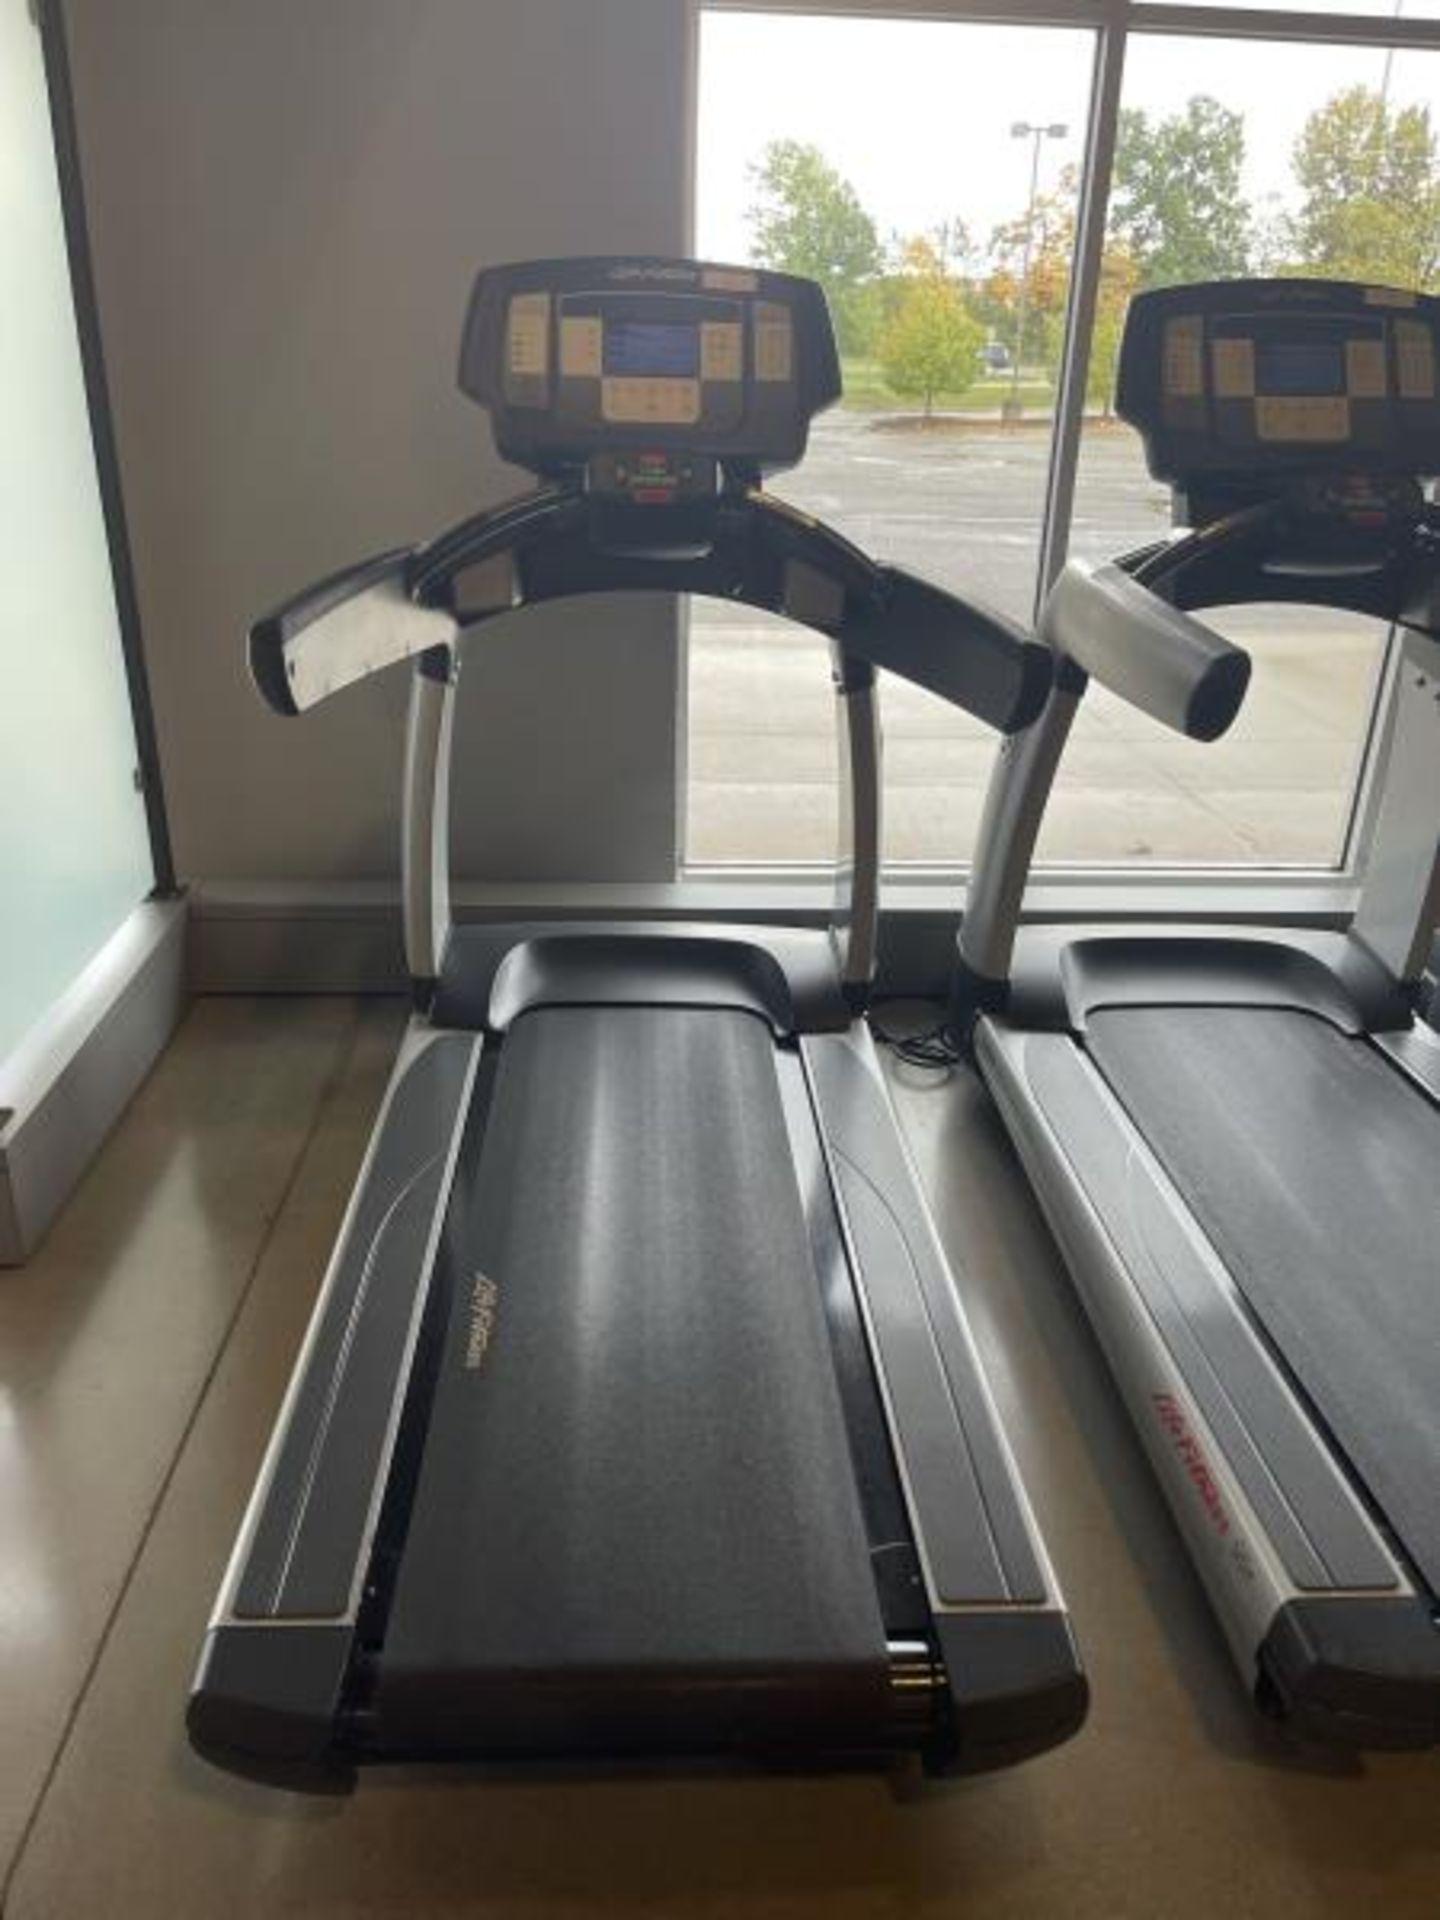 Life Fitness Treadmill M: 95T with Flex Deck, Shock Absorption System SN: TET107106